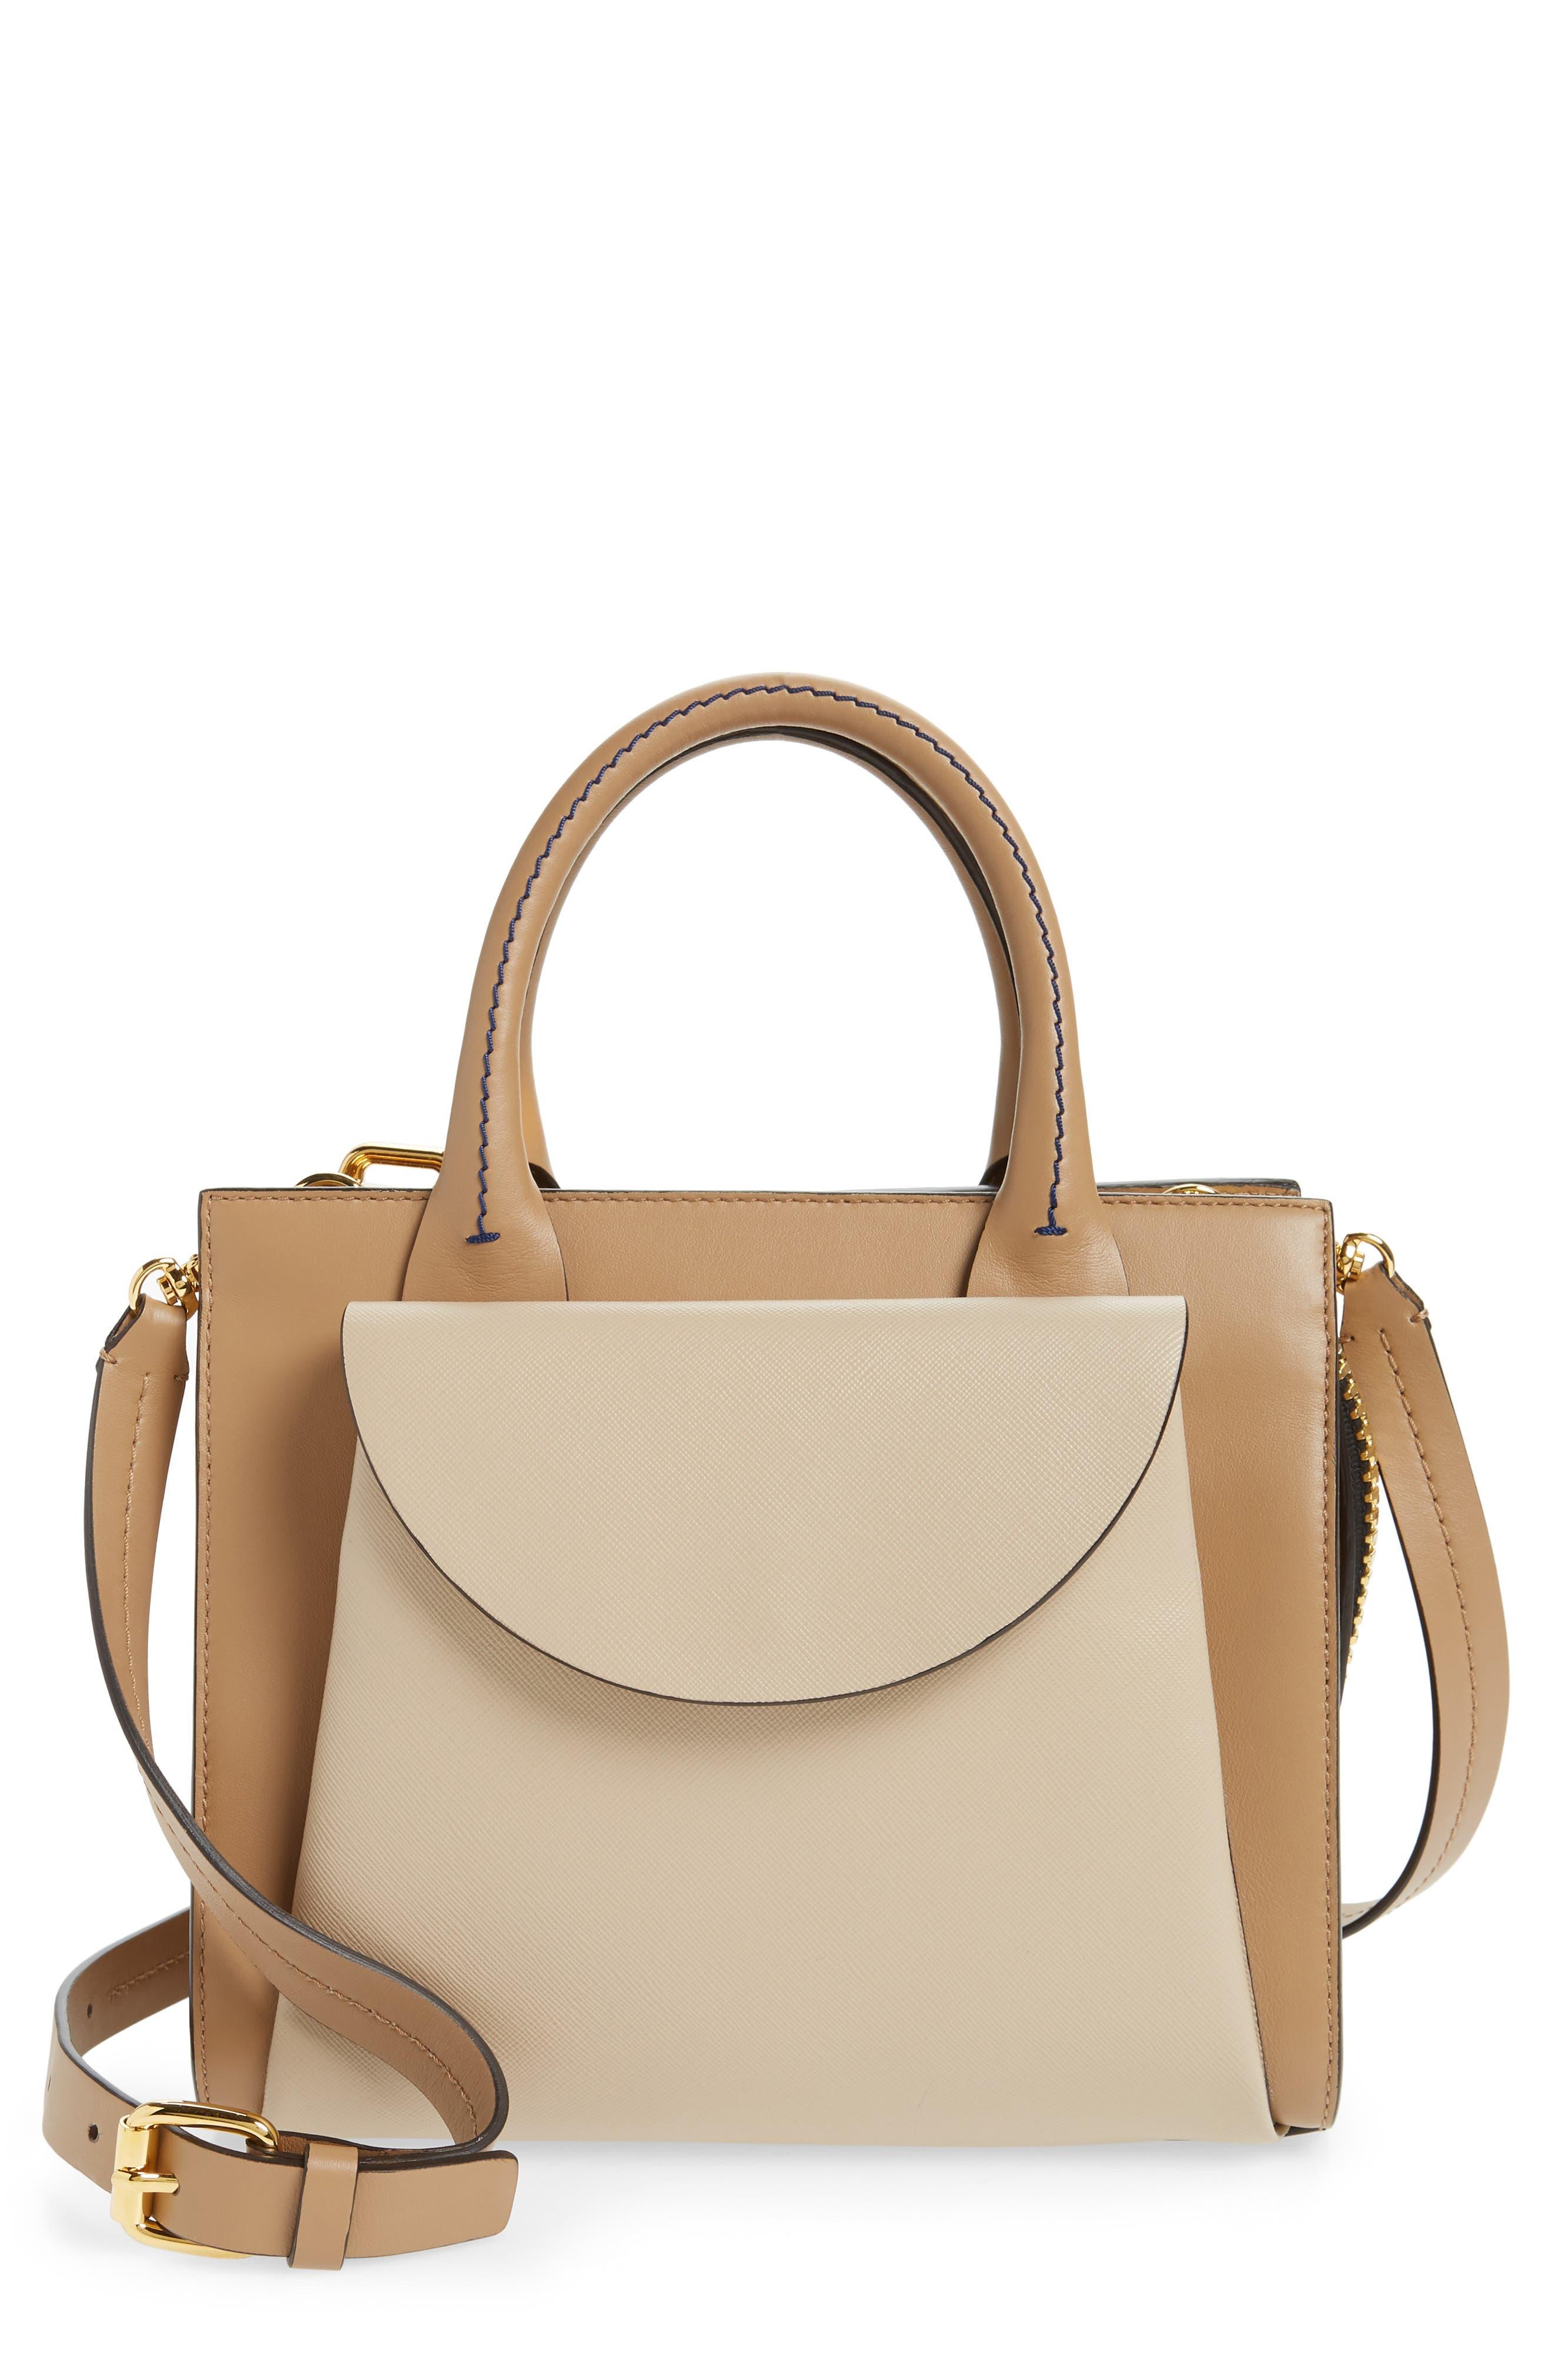 2ffe745c9368 marni handbags for women